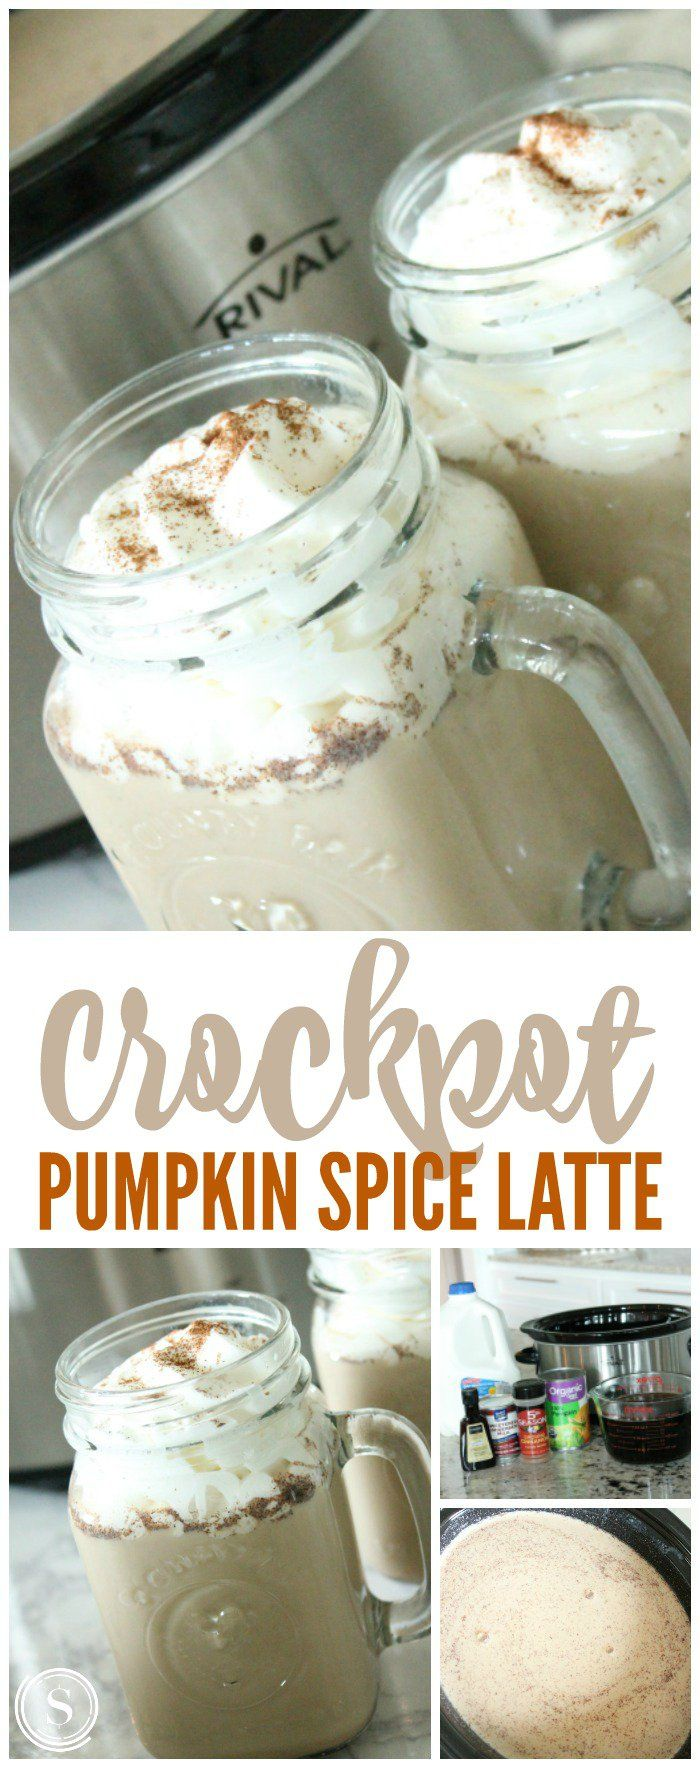 Crockpot Pumpkin Spice Latte! My NEW Favorite Fall Drink Recipe for…